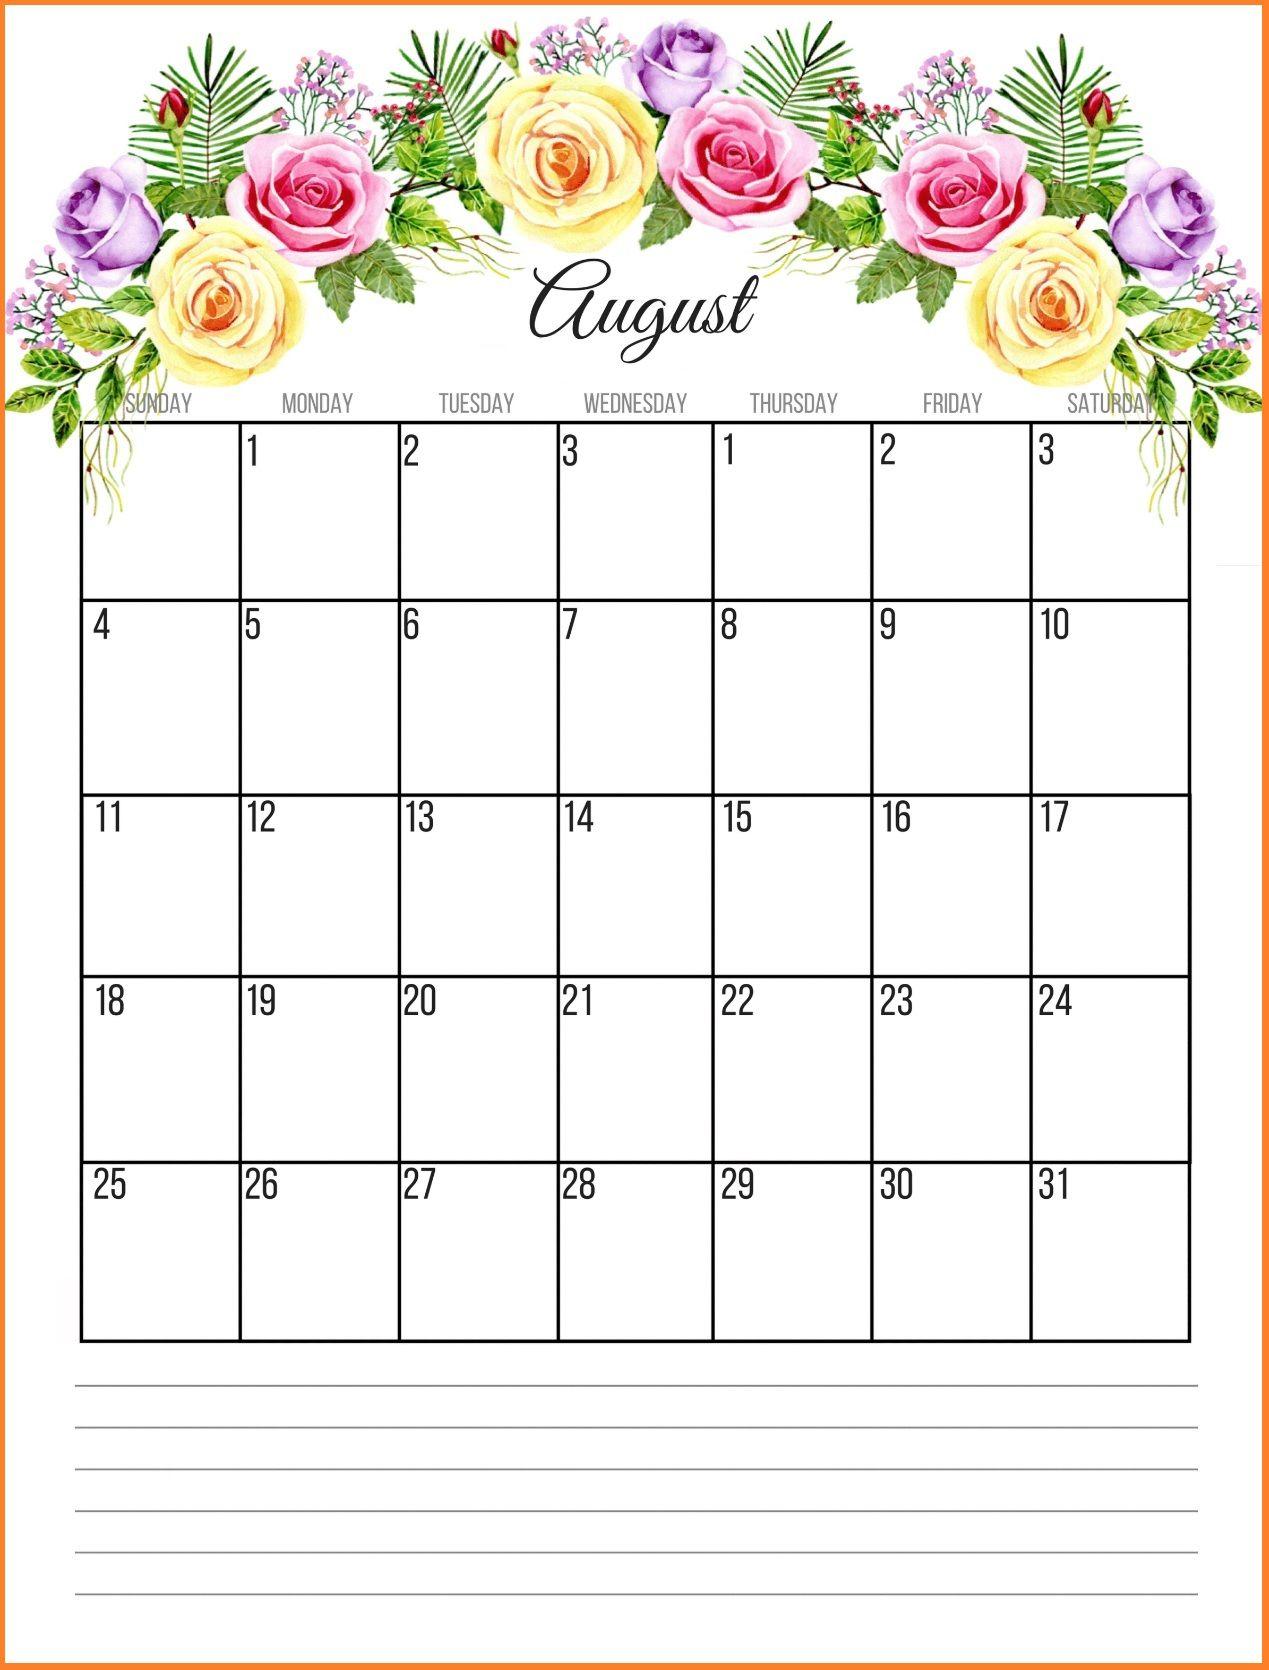 August 2019 Floral Calendar | Paper Crafts | Calendar June, June inside Cute August Calendar Printable Template